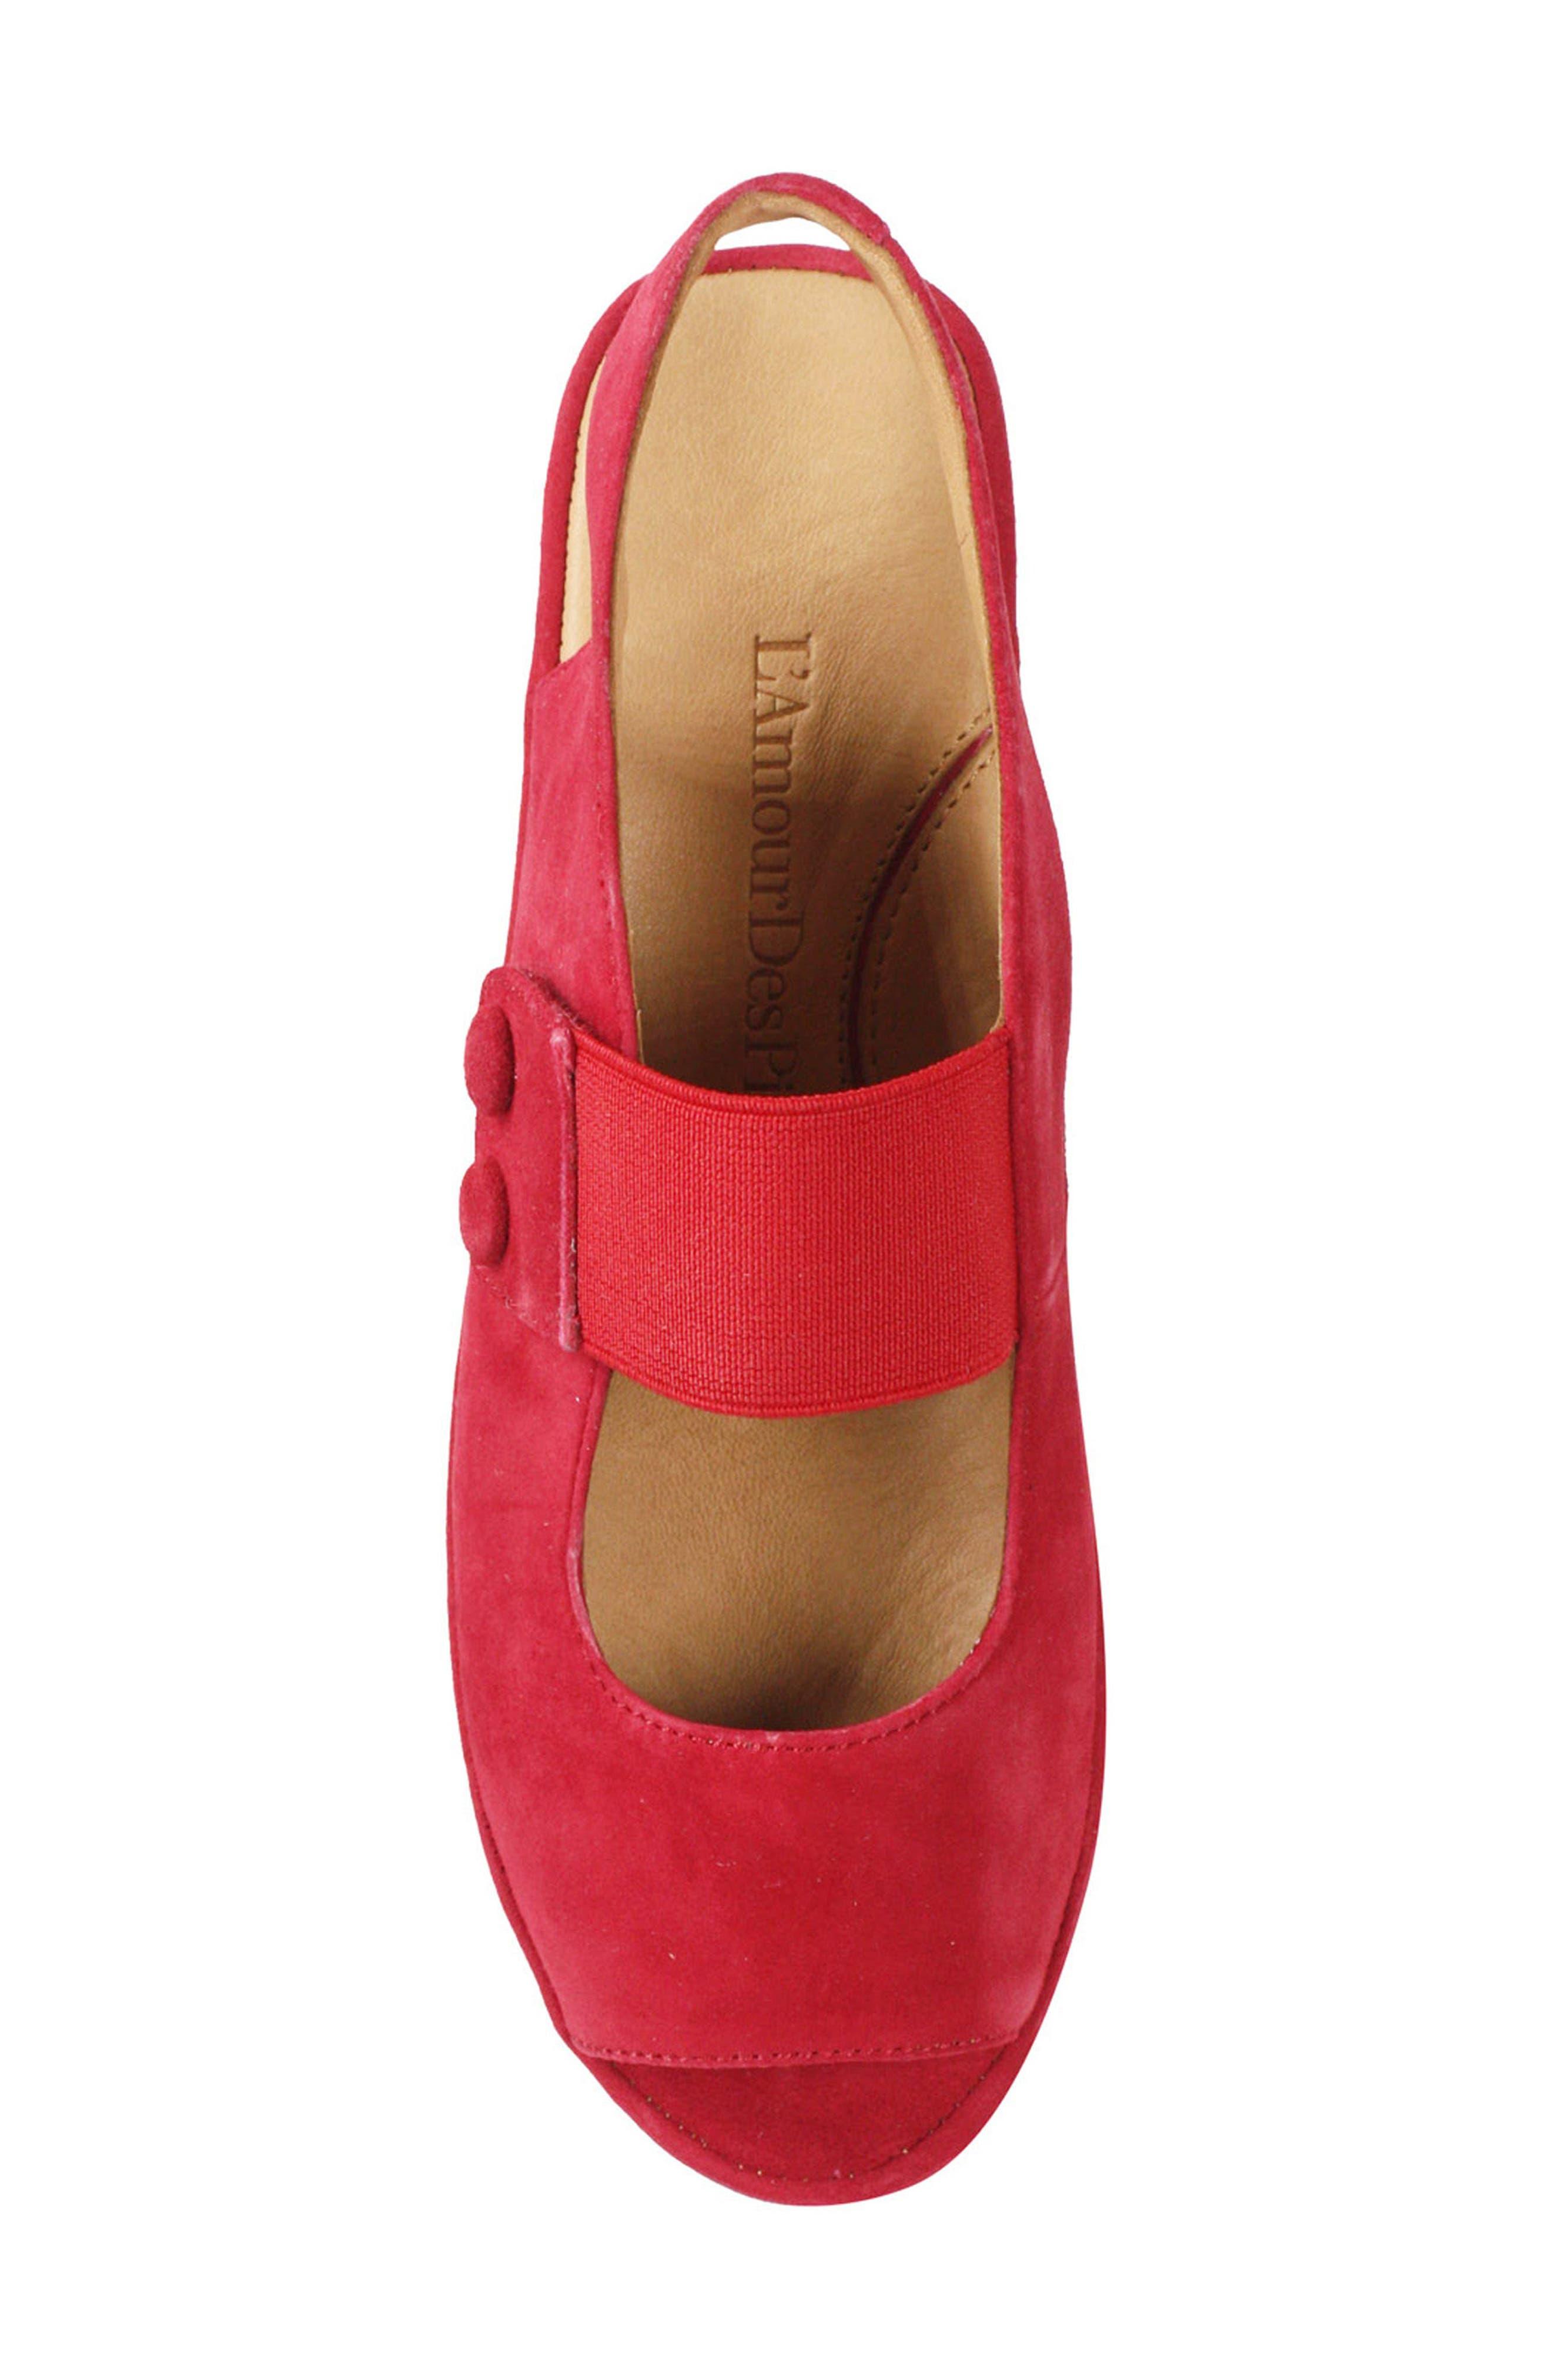 Adalicia Platform Sandal,                             Alternate thumbnail 5, color,                             Bright Red Suede